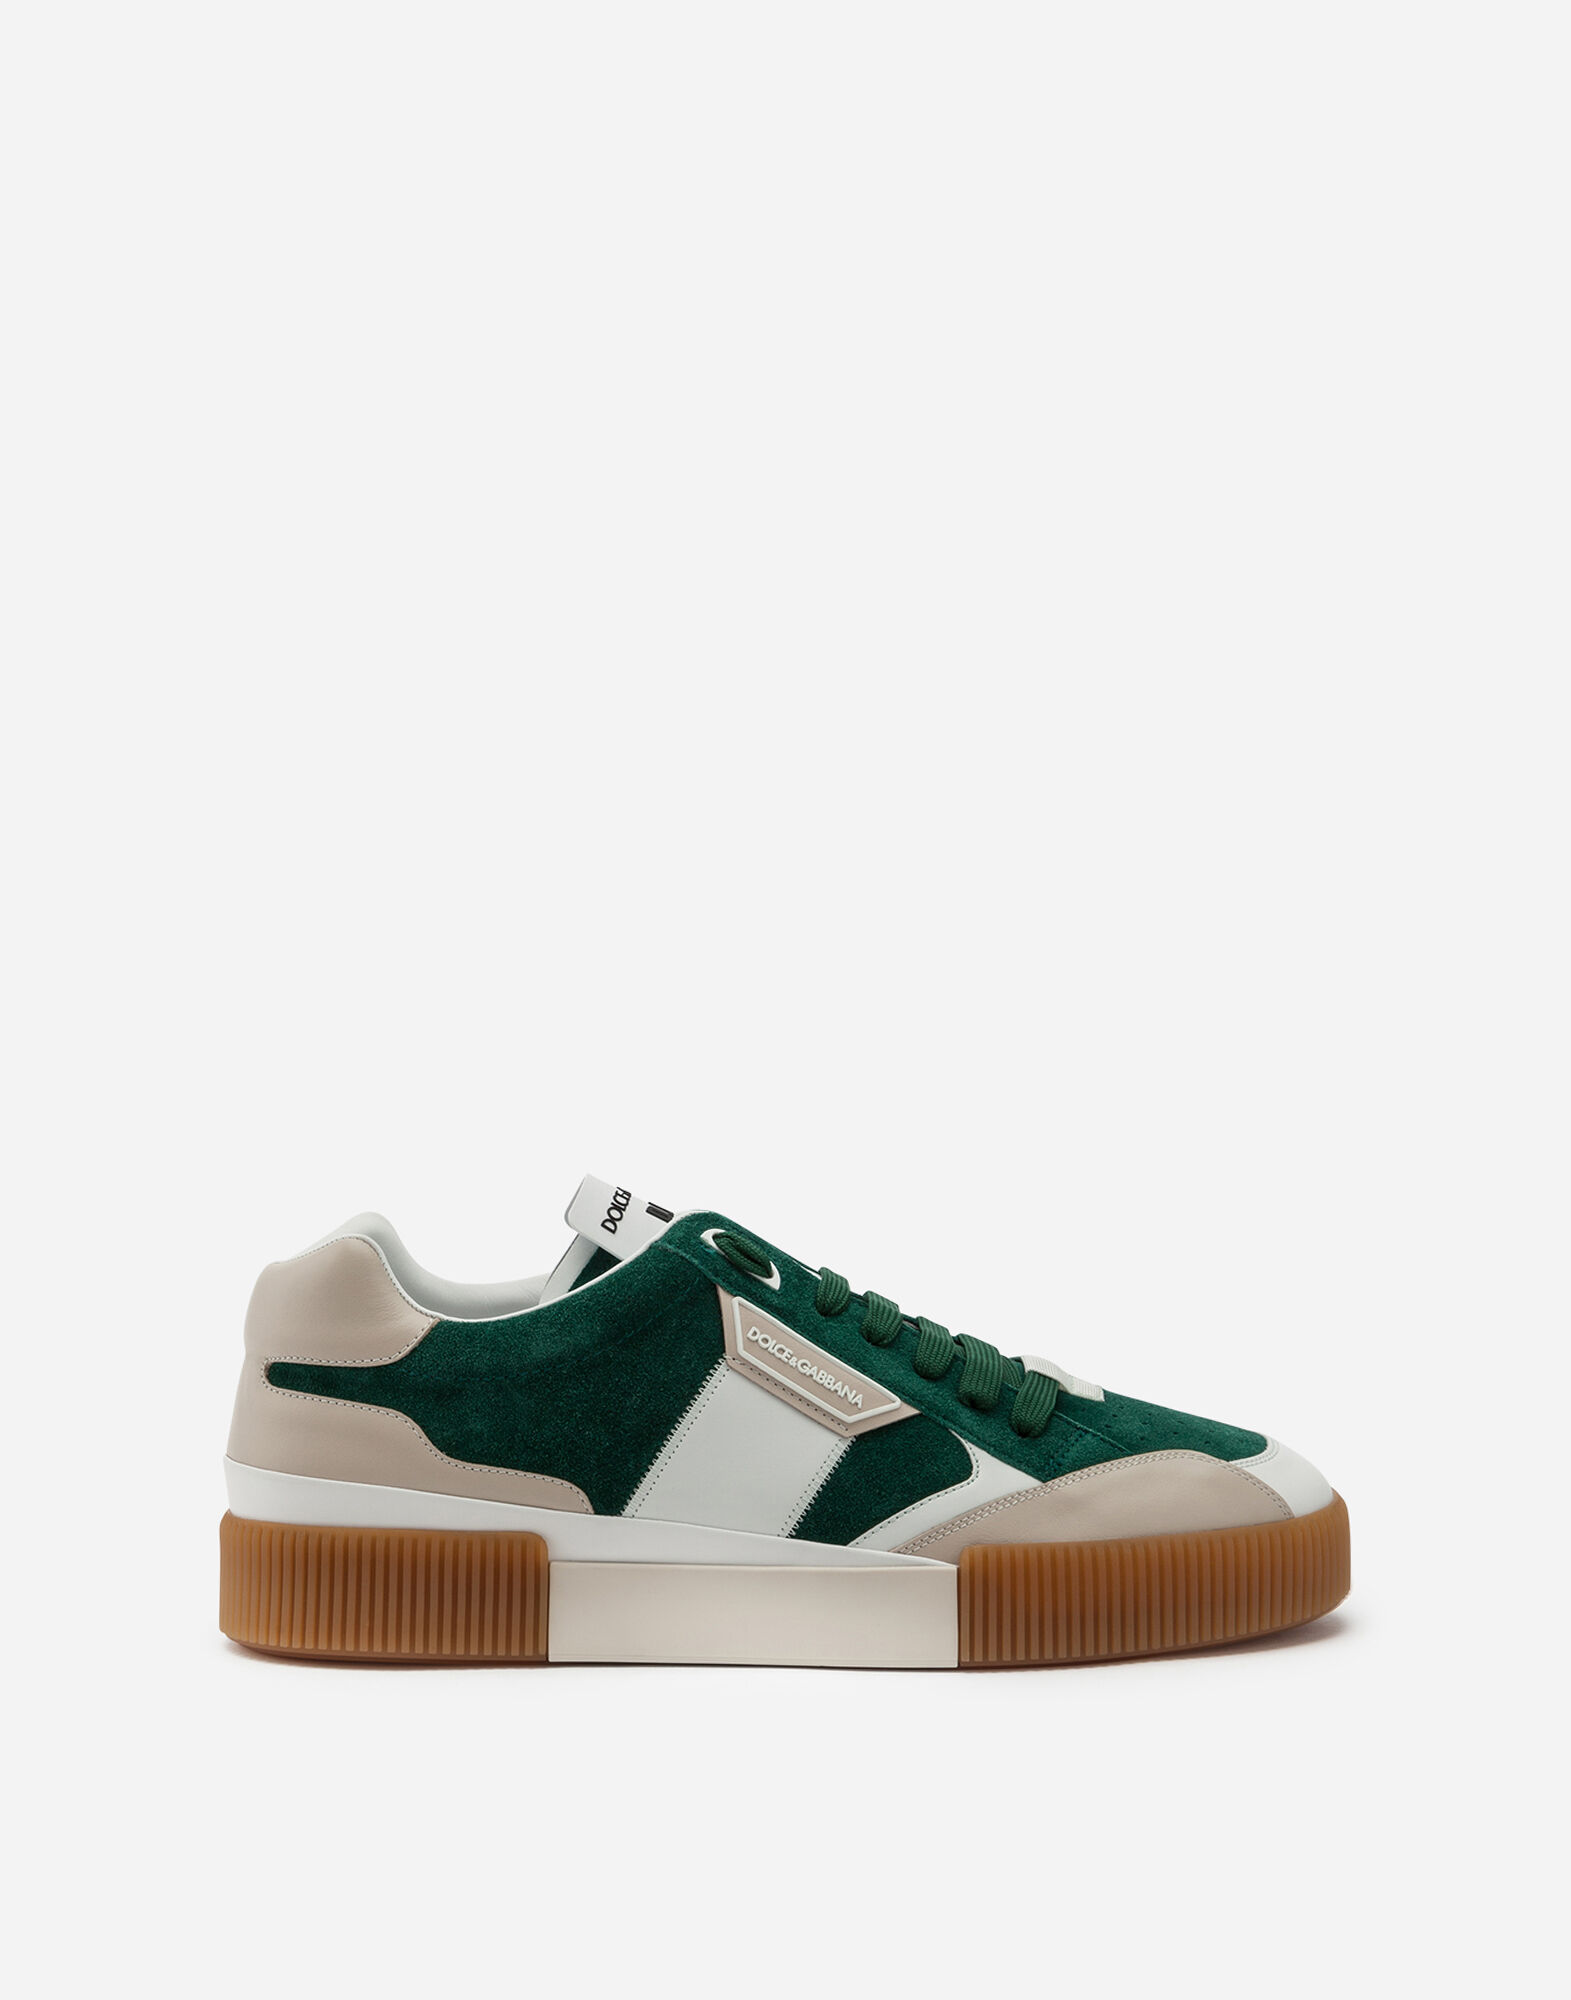 amp;gabbana Sneakers On HommeDolce Et Pour Slip WED2e9YHI